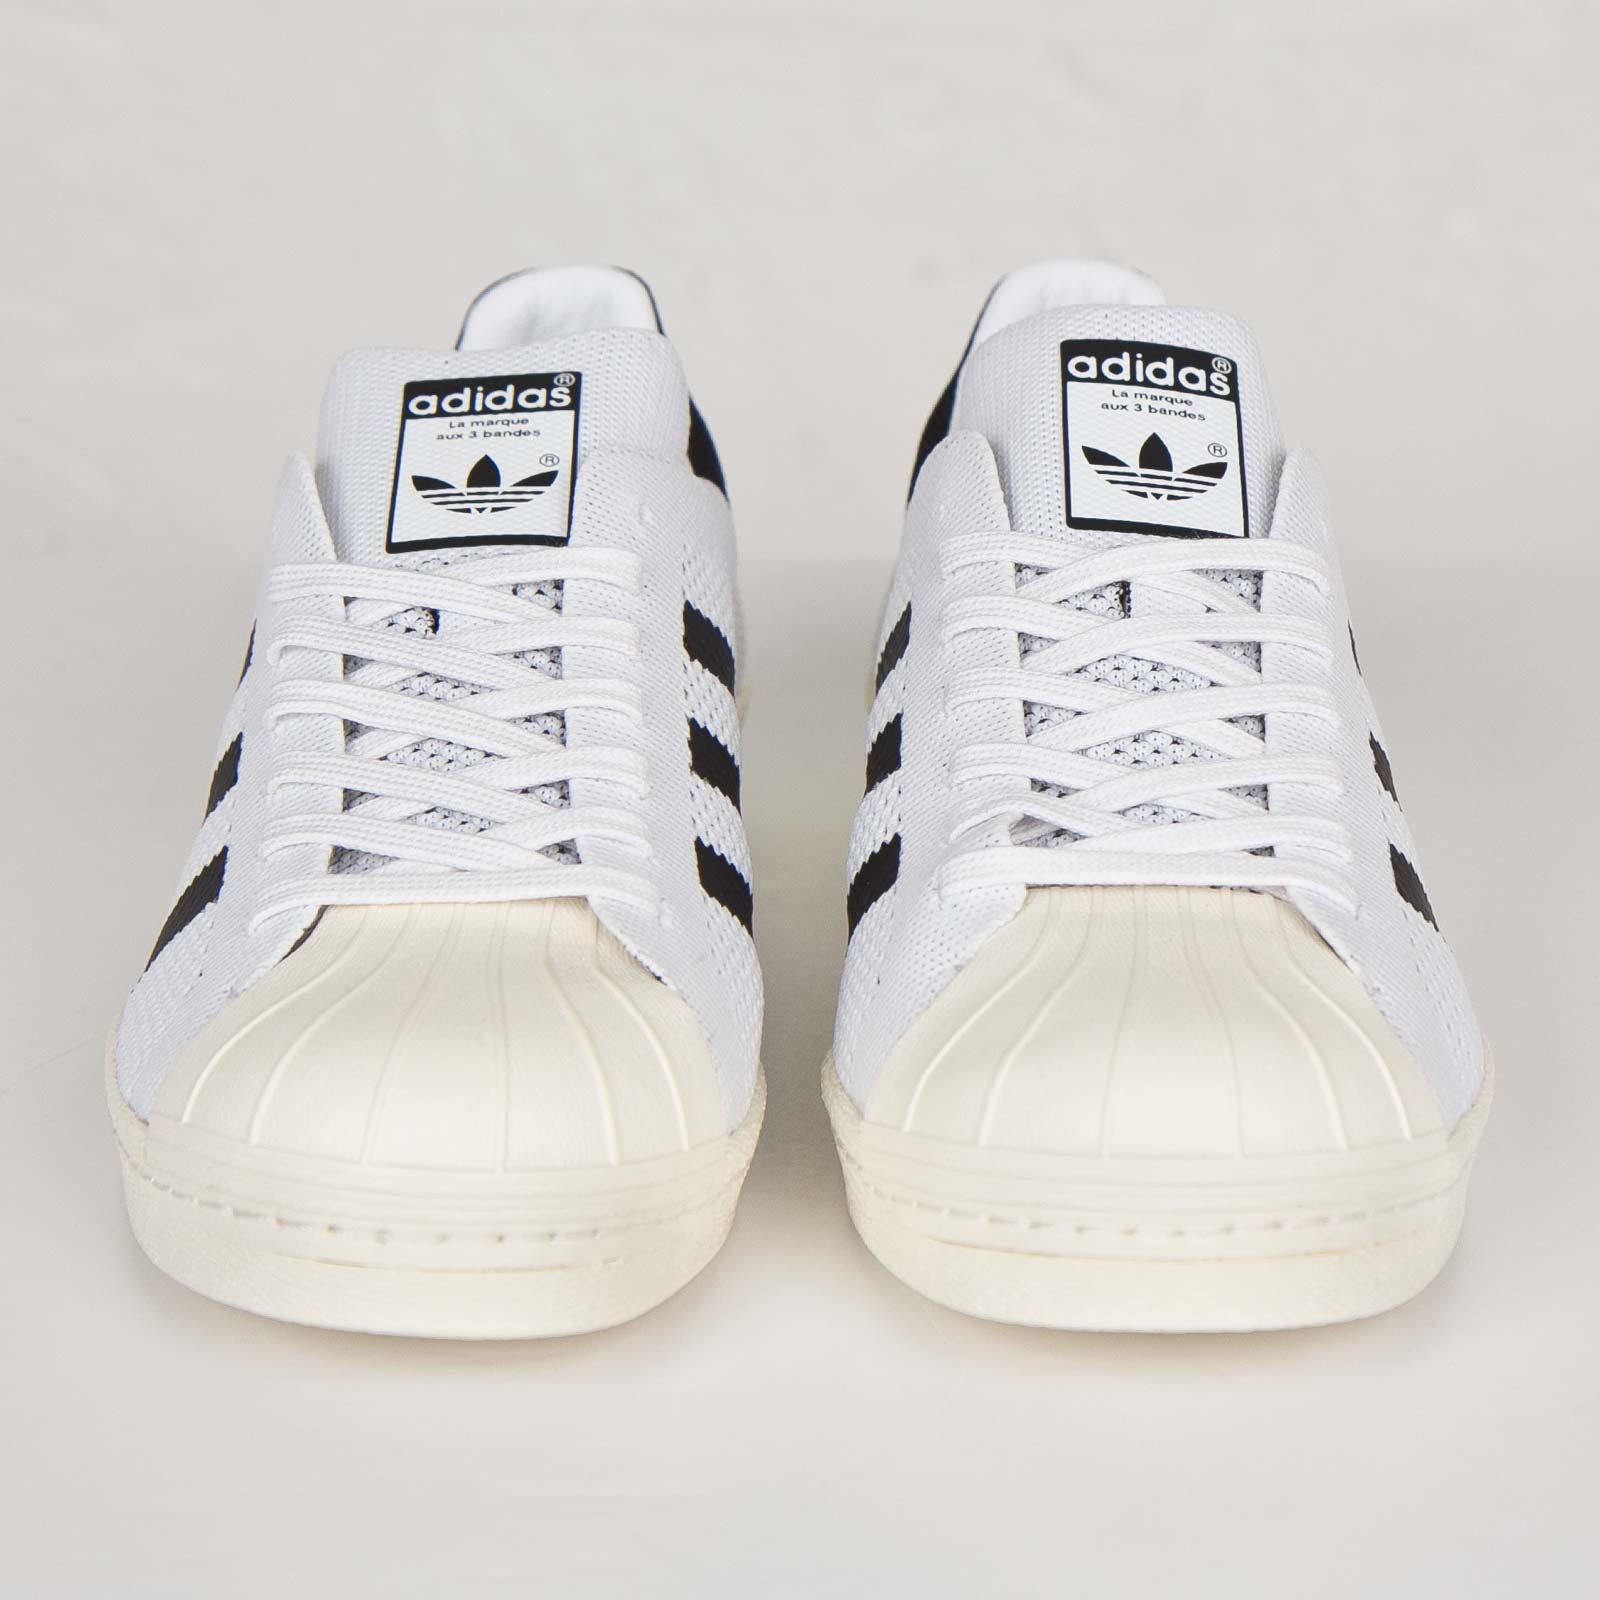 best sneakers f2450 0ef6f adidas Superstar 80s PK - S77440 - Sneakersnstuff | sneakers ...